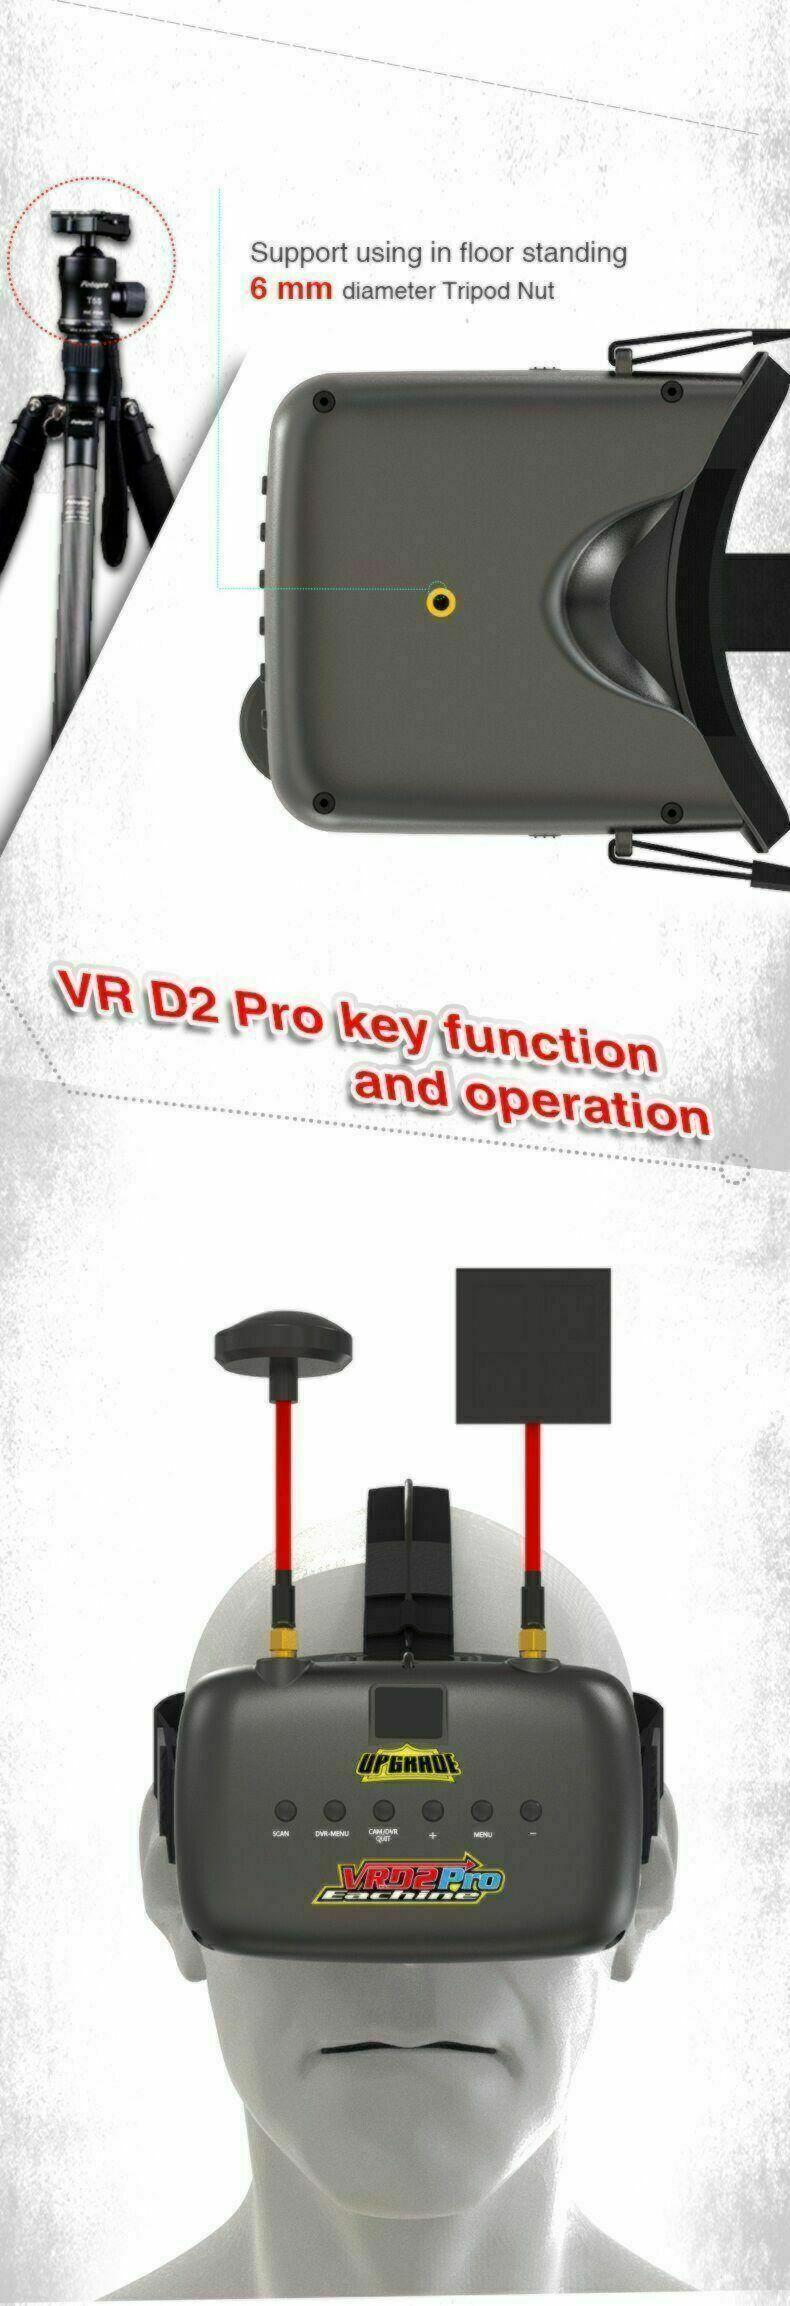 Eachine VRD2 PRO - FPV Video Goggles | Monitor /w Diversity RX